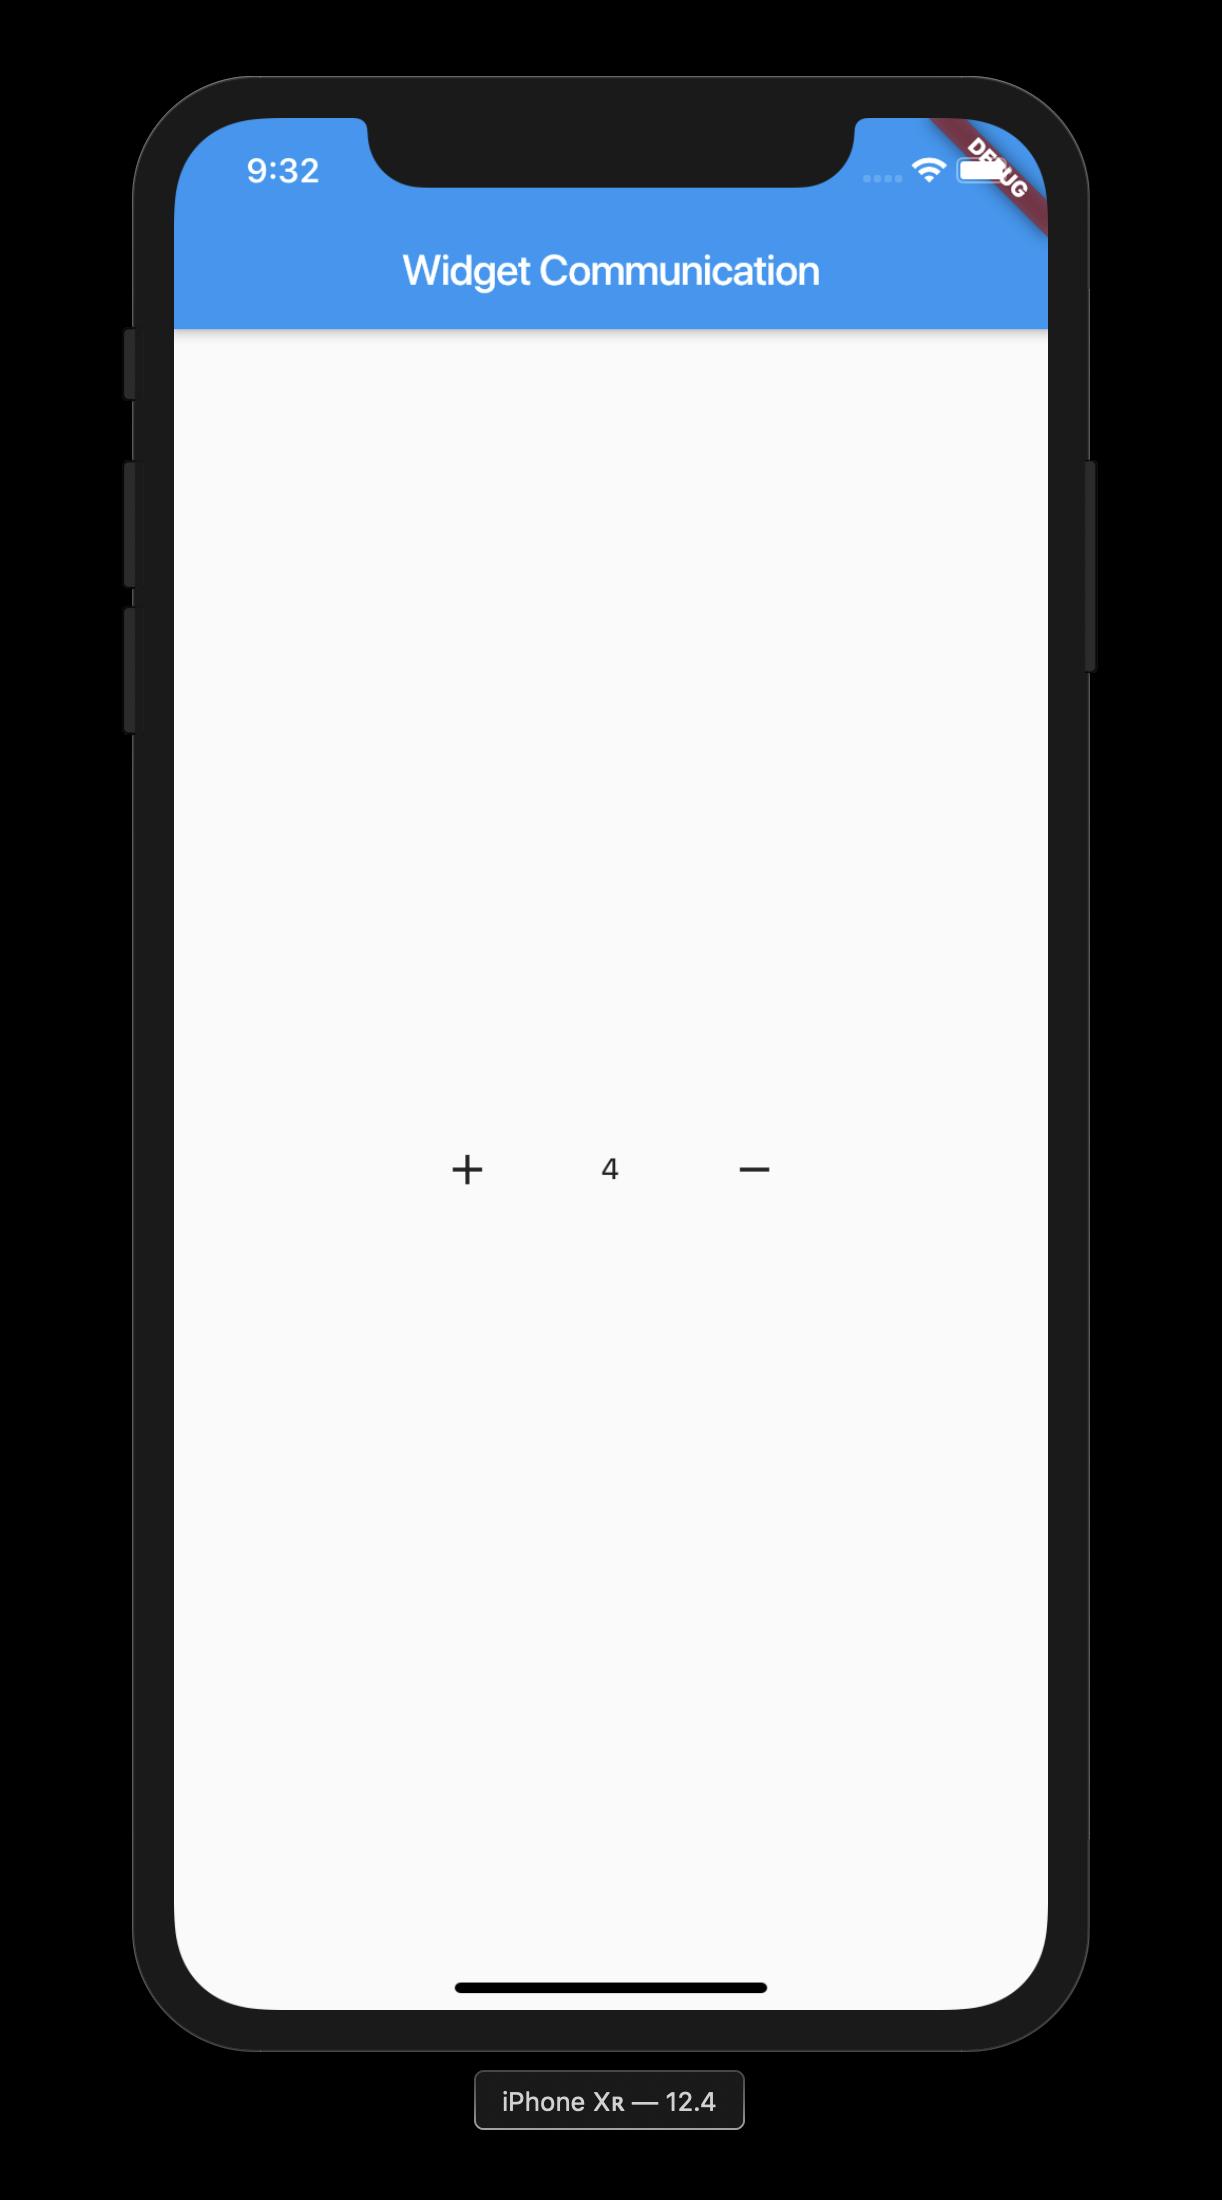 Widget communication